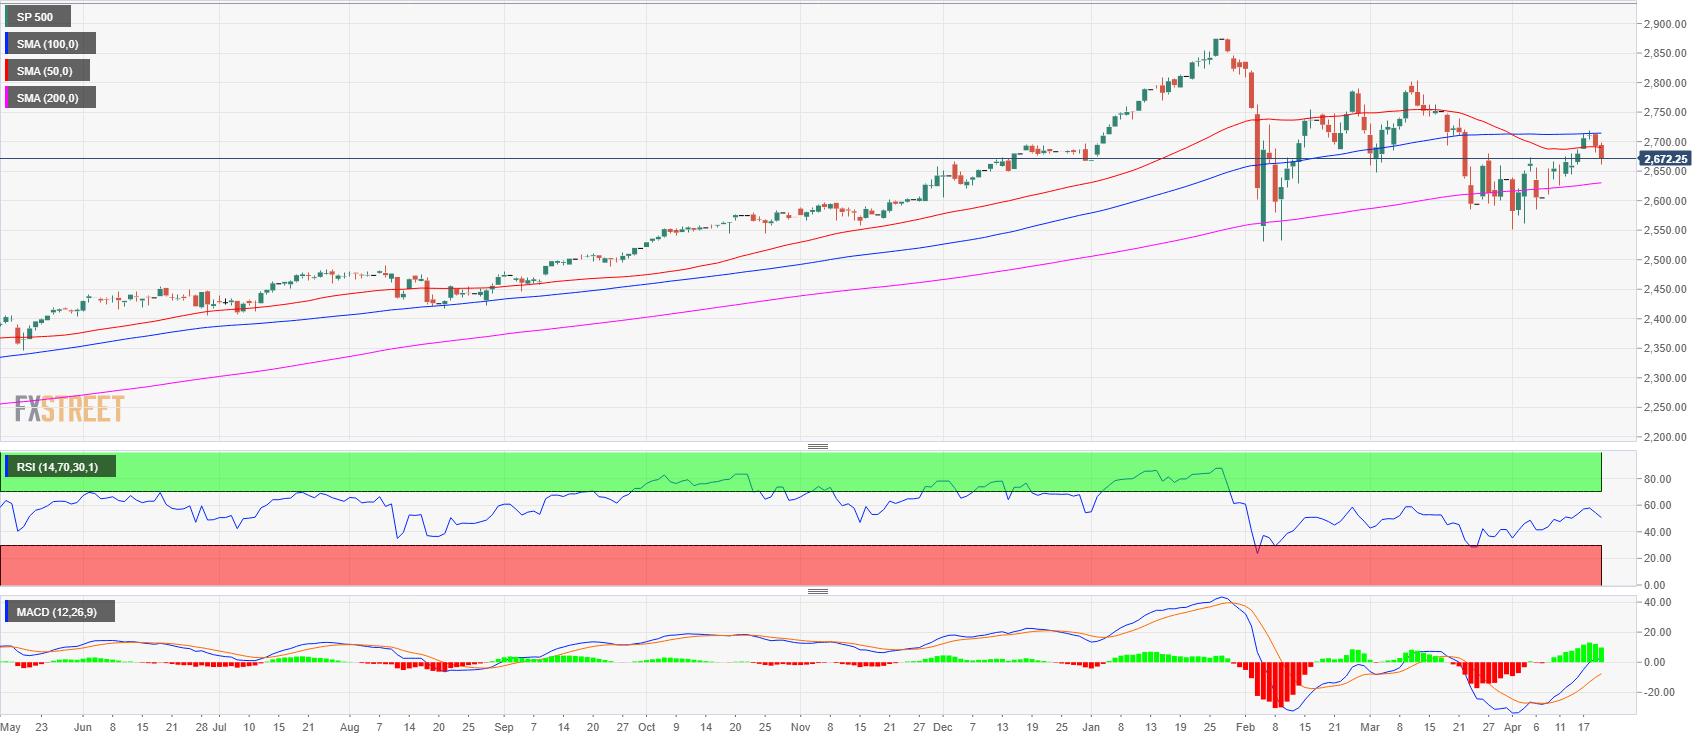 Wall Street stocks down as US bond yields hit new highs